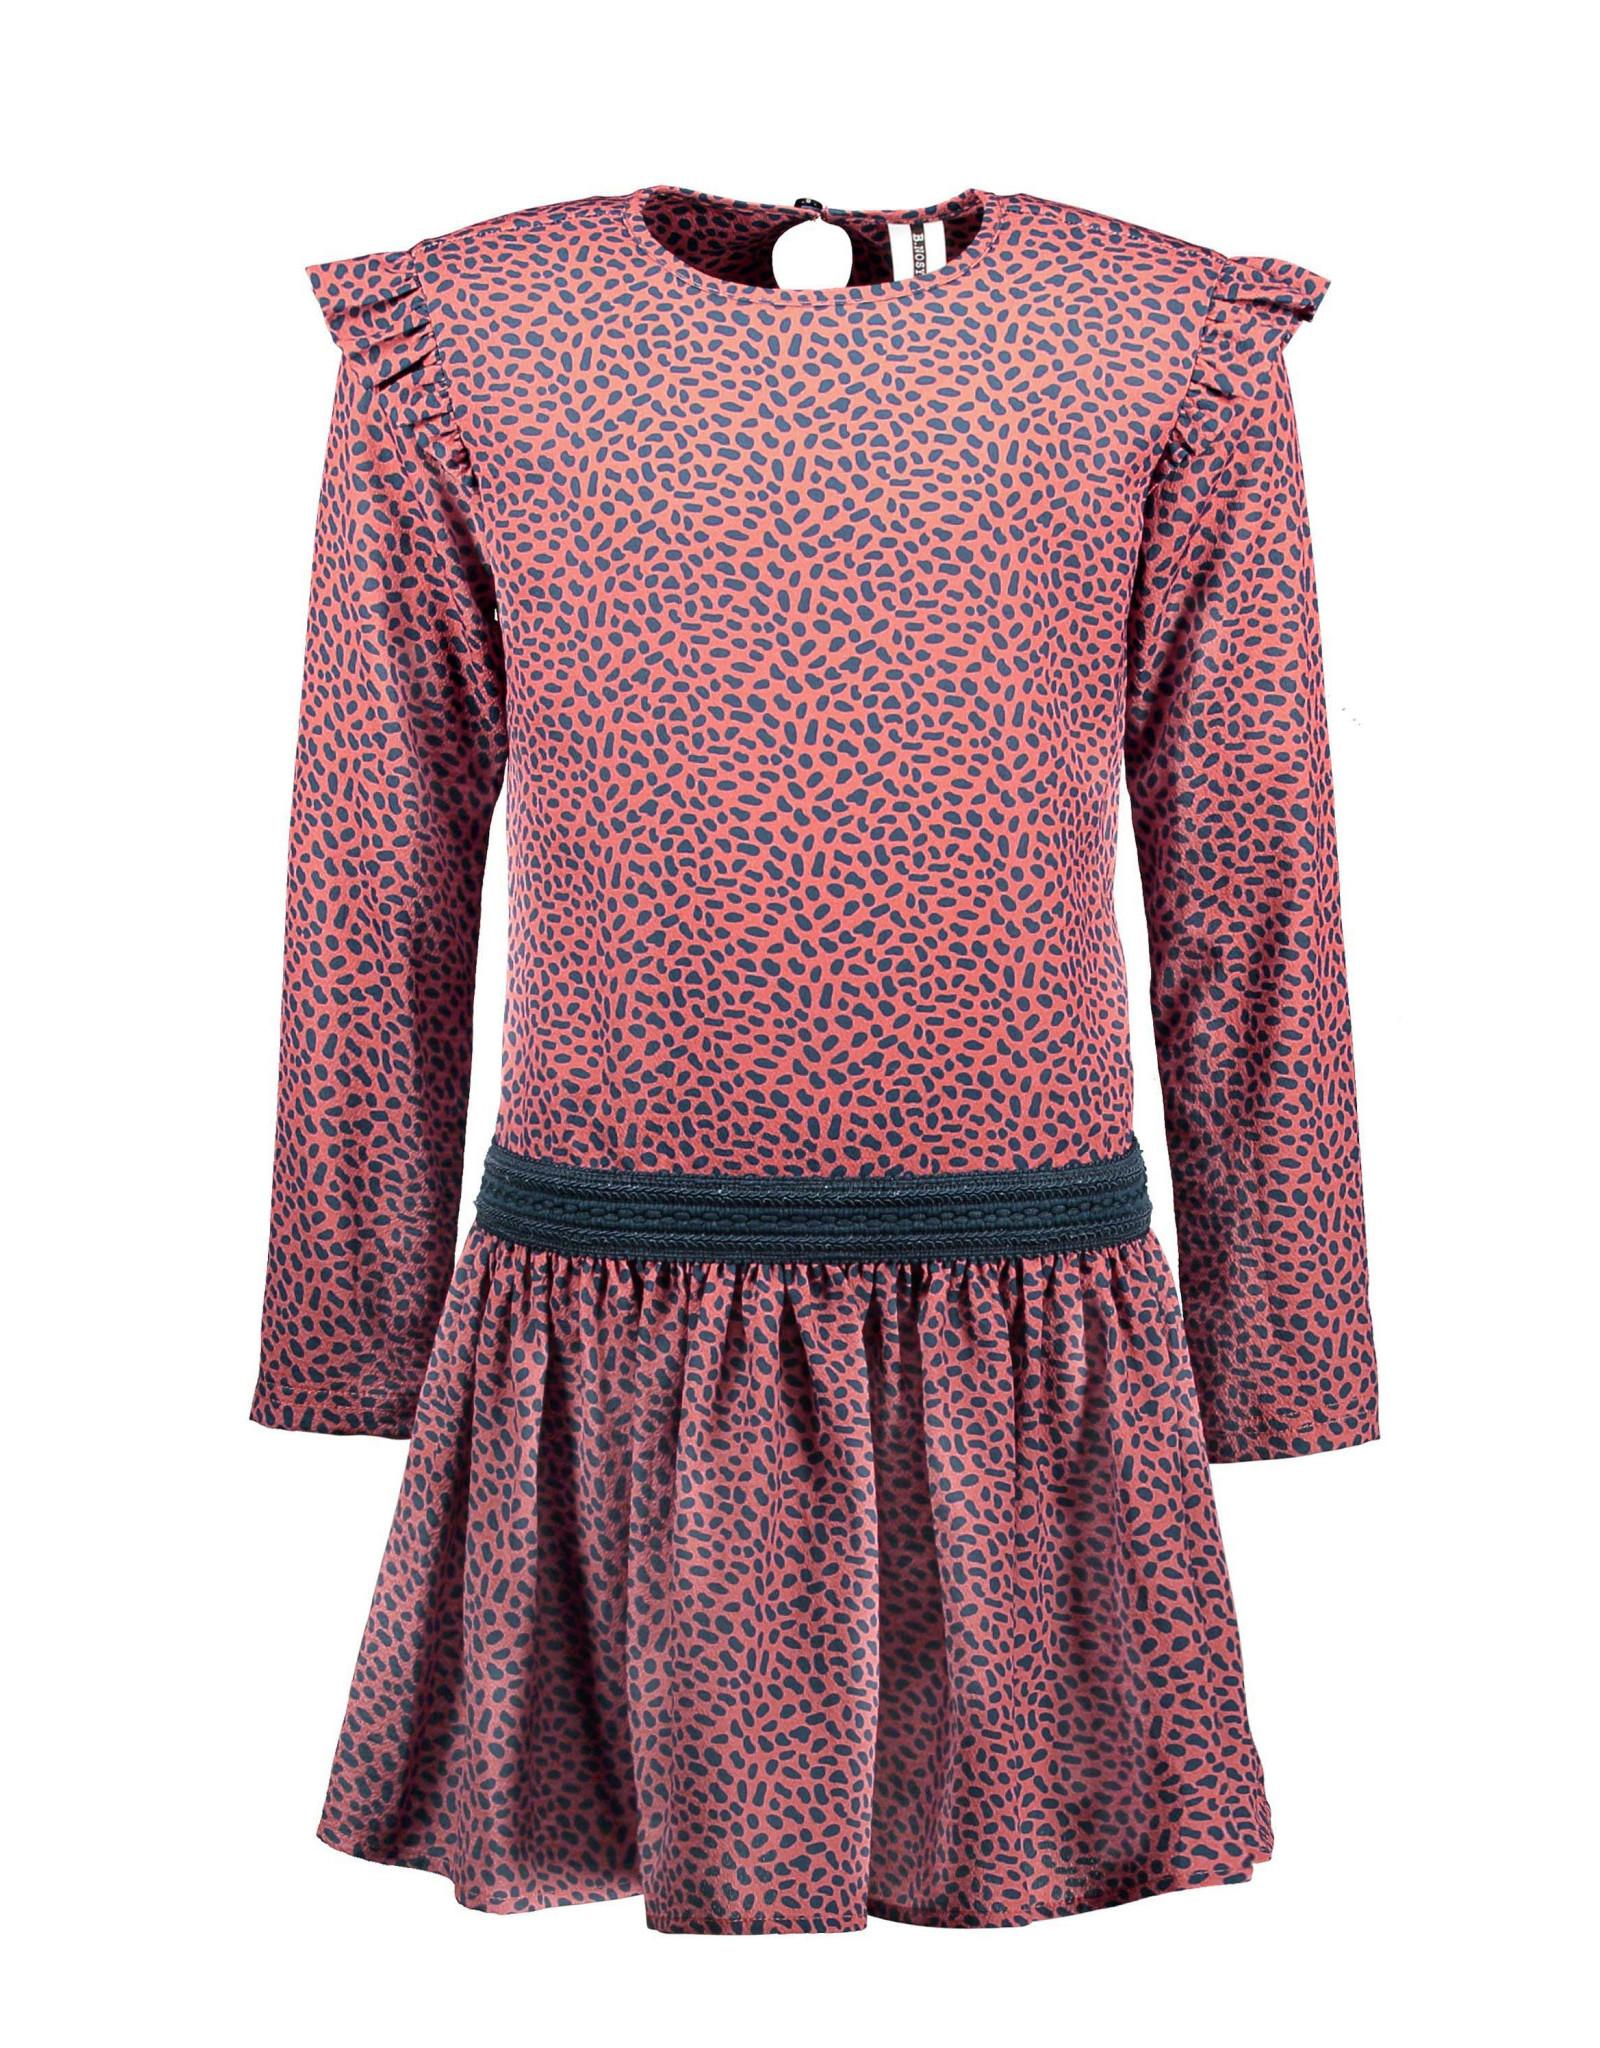 B.Nosy B.Nosy meisjes jurk Mix Dots S21